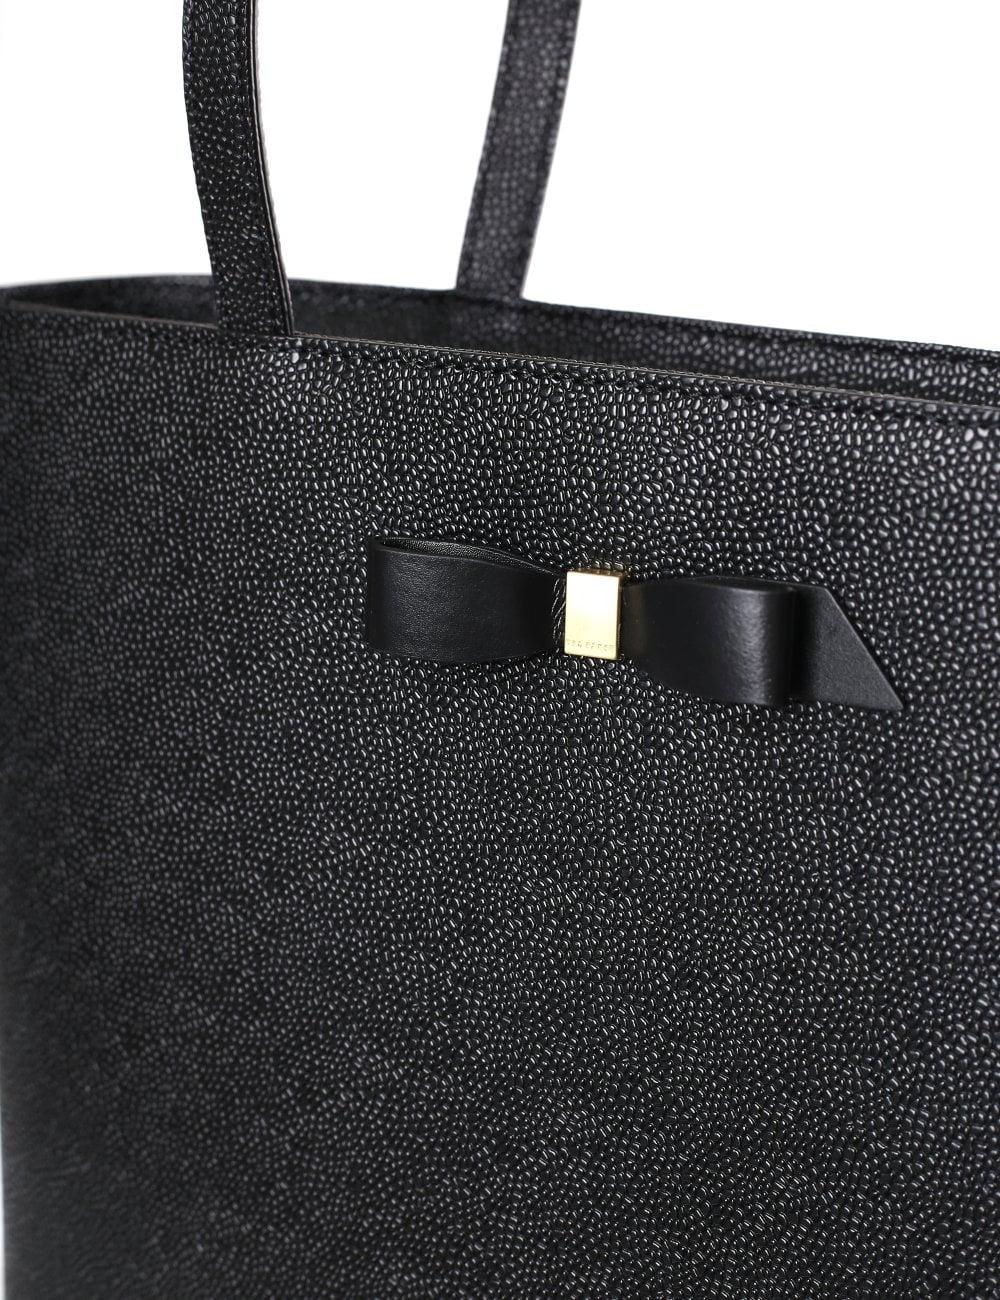 f5a8d37f5 Ted Baker Women s Jjesica Bow Detail Shopper Bag